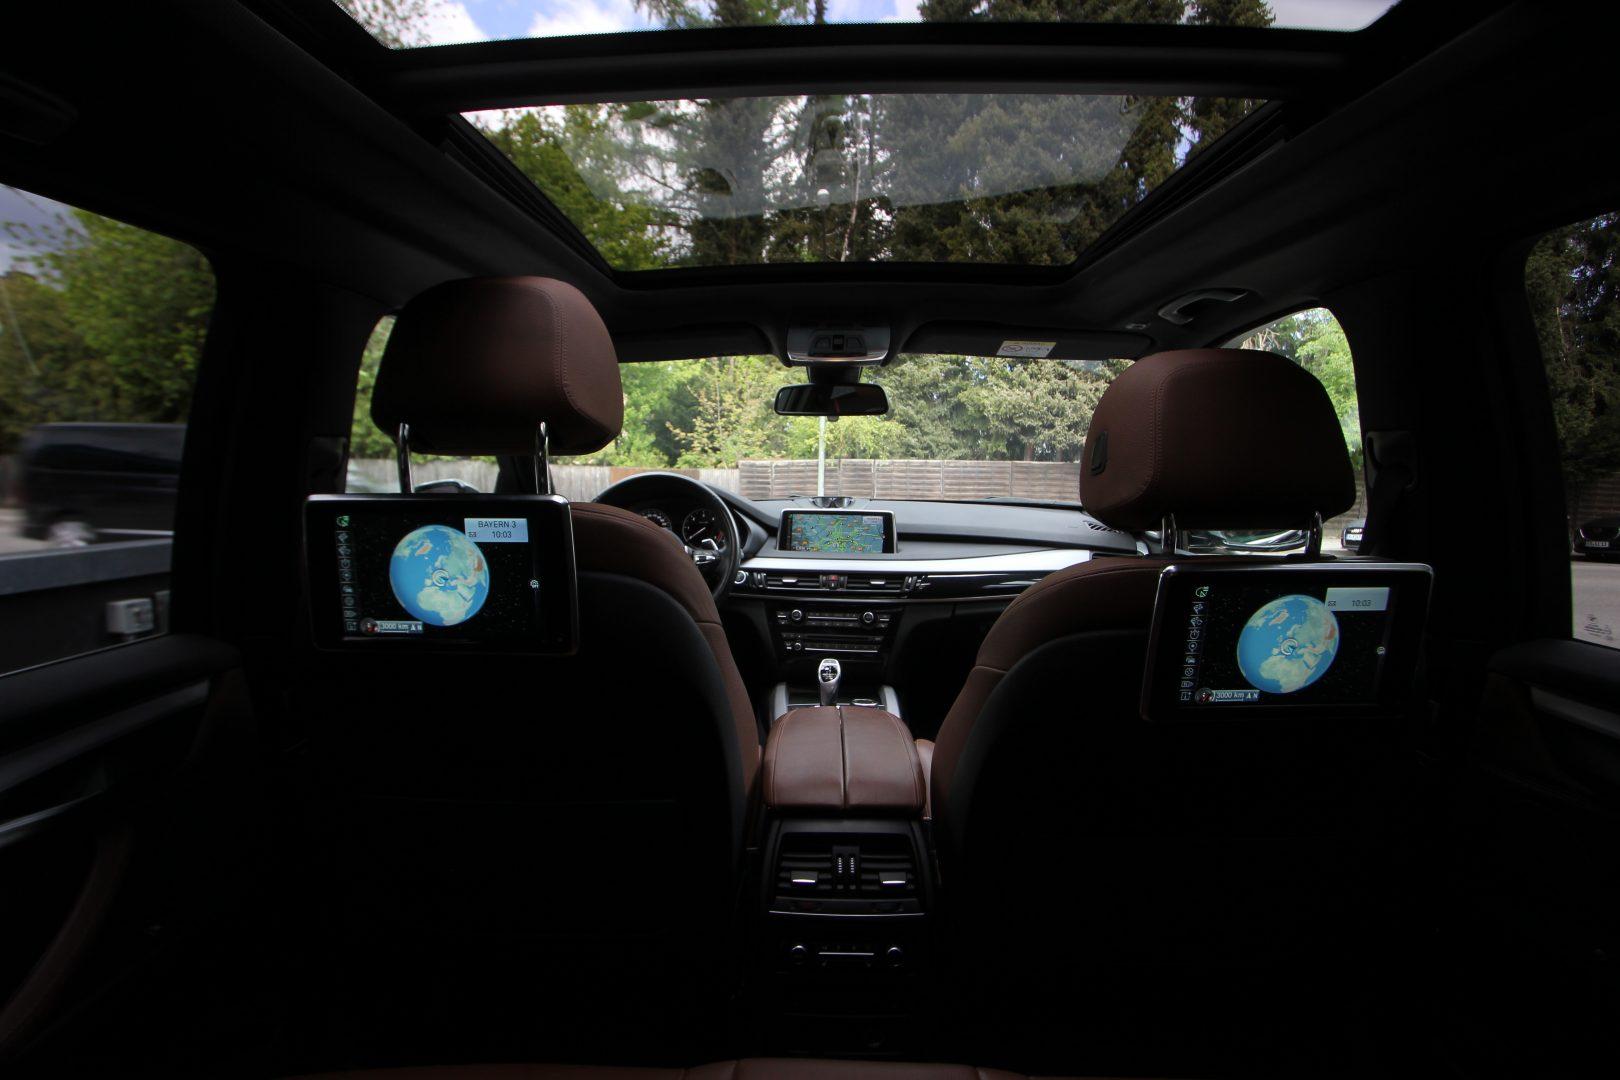 AIL BMW X5 M50d Bang & Olufsen Panorama RSE 16